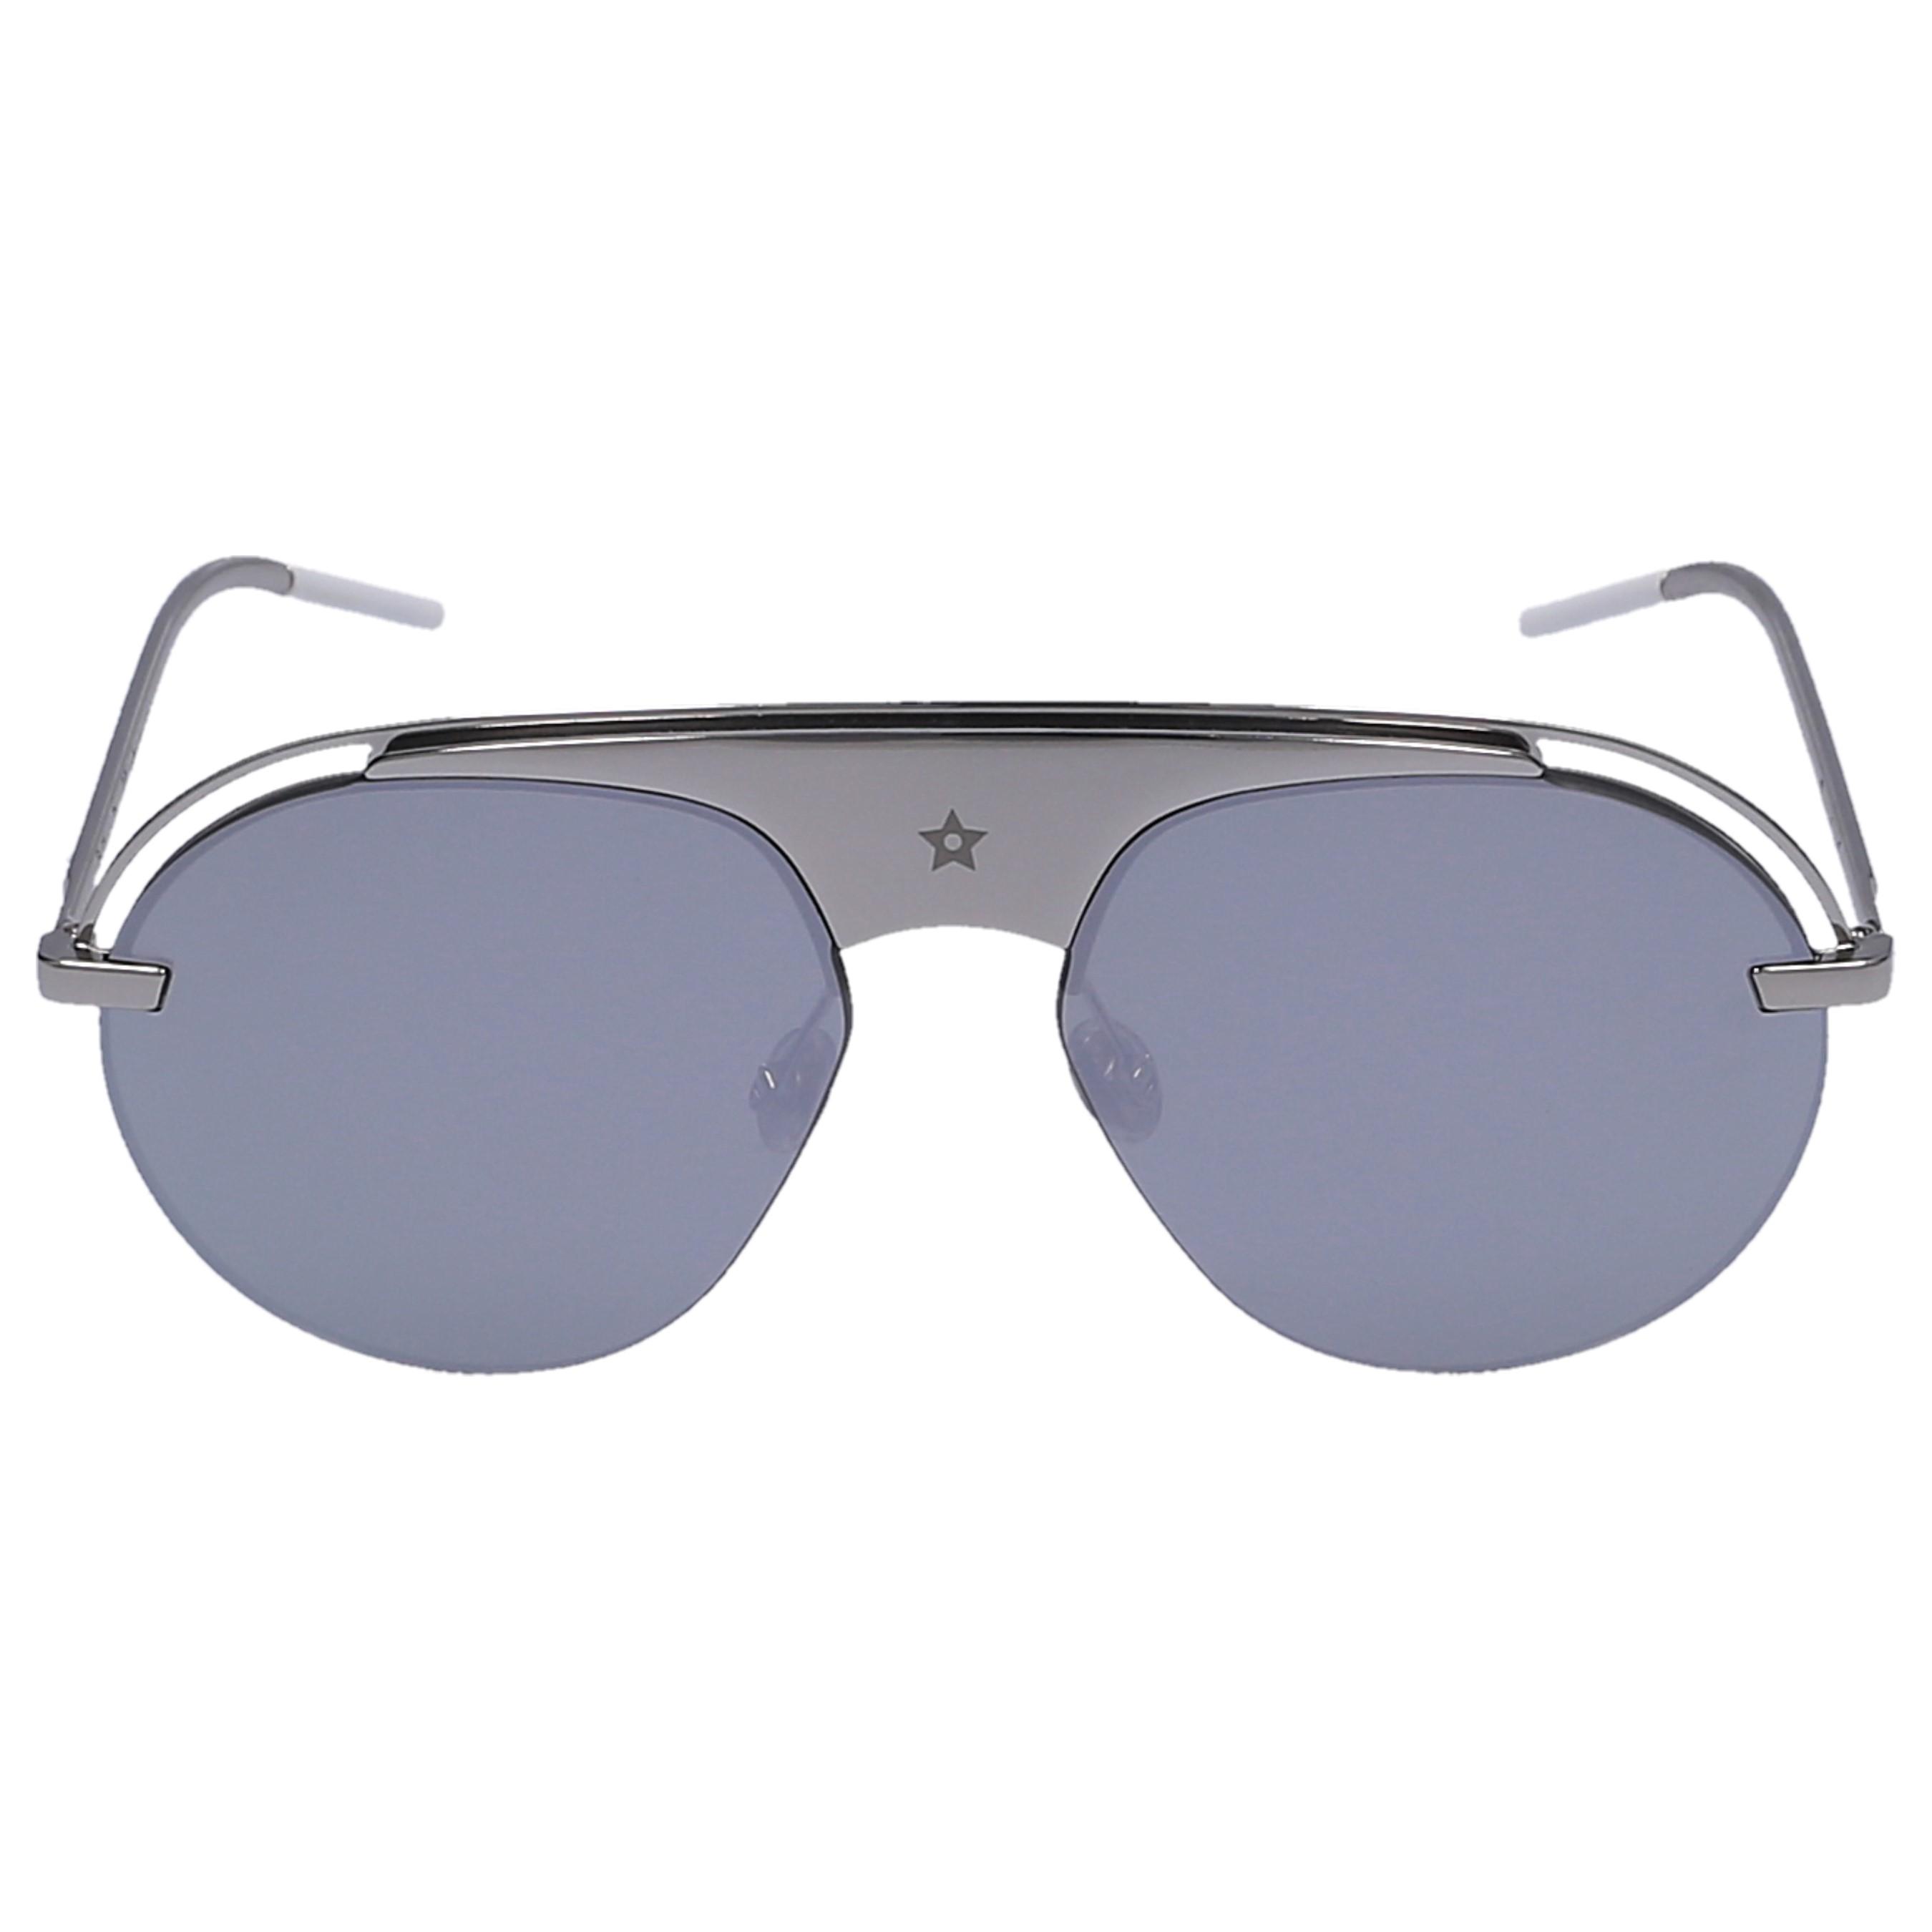 Dior Sonnenbrille Aviator EVOLUT KJ1 Metall schwarz